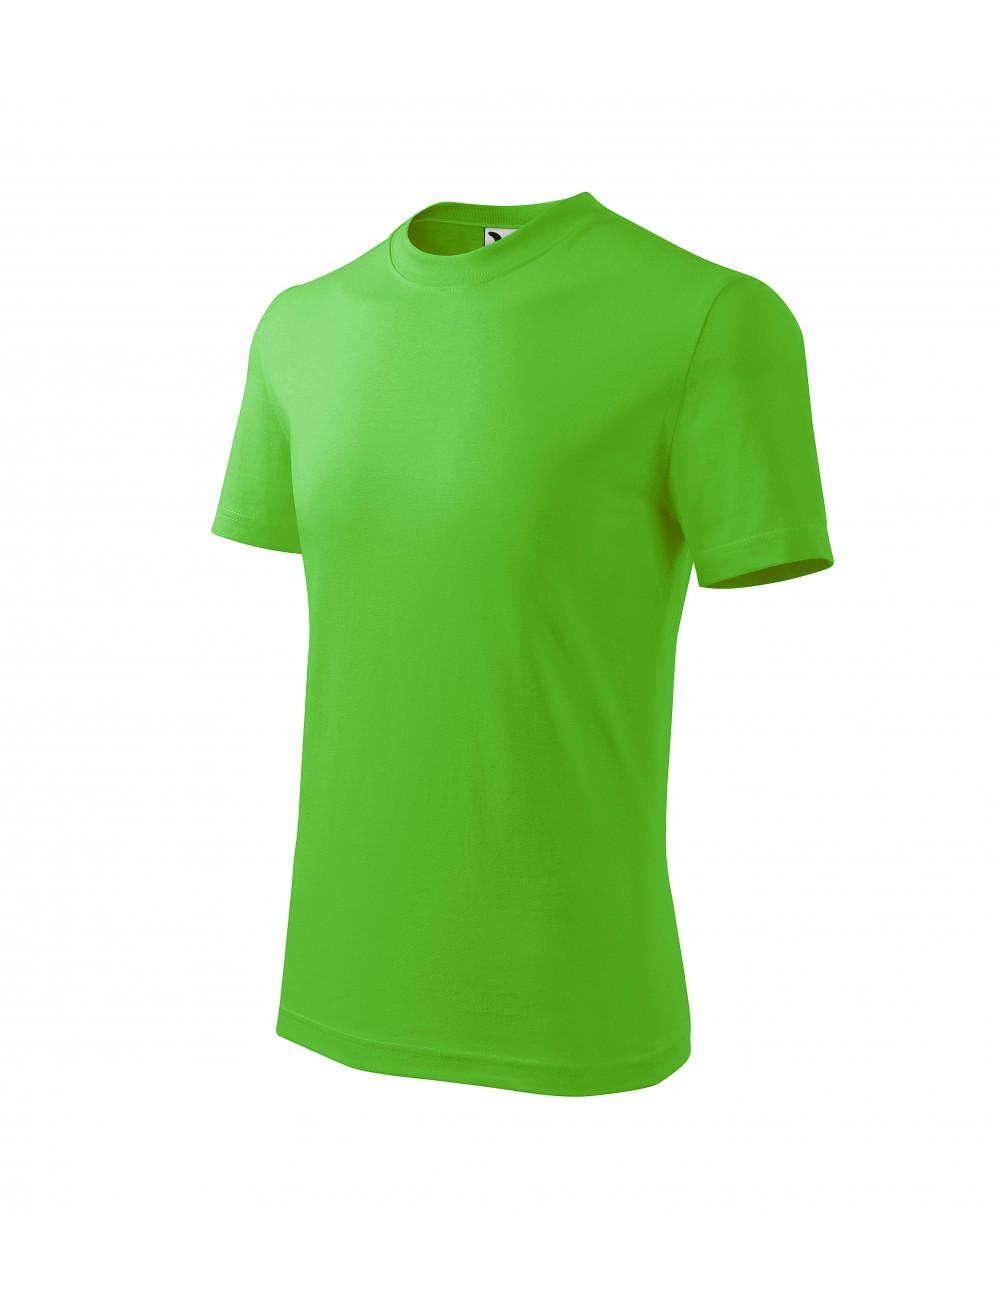 Adler MALFINI Koszulka dziecięca Basic 138 green apple